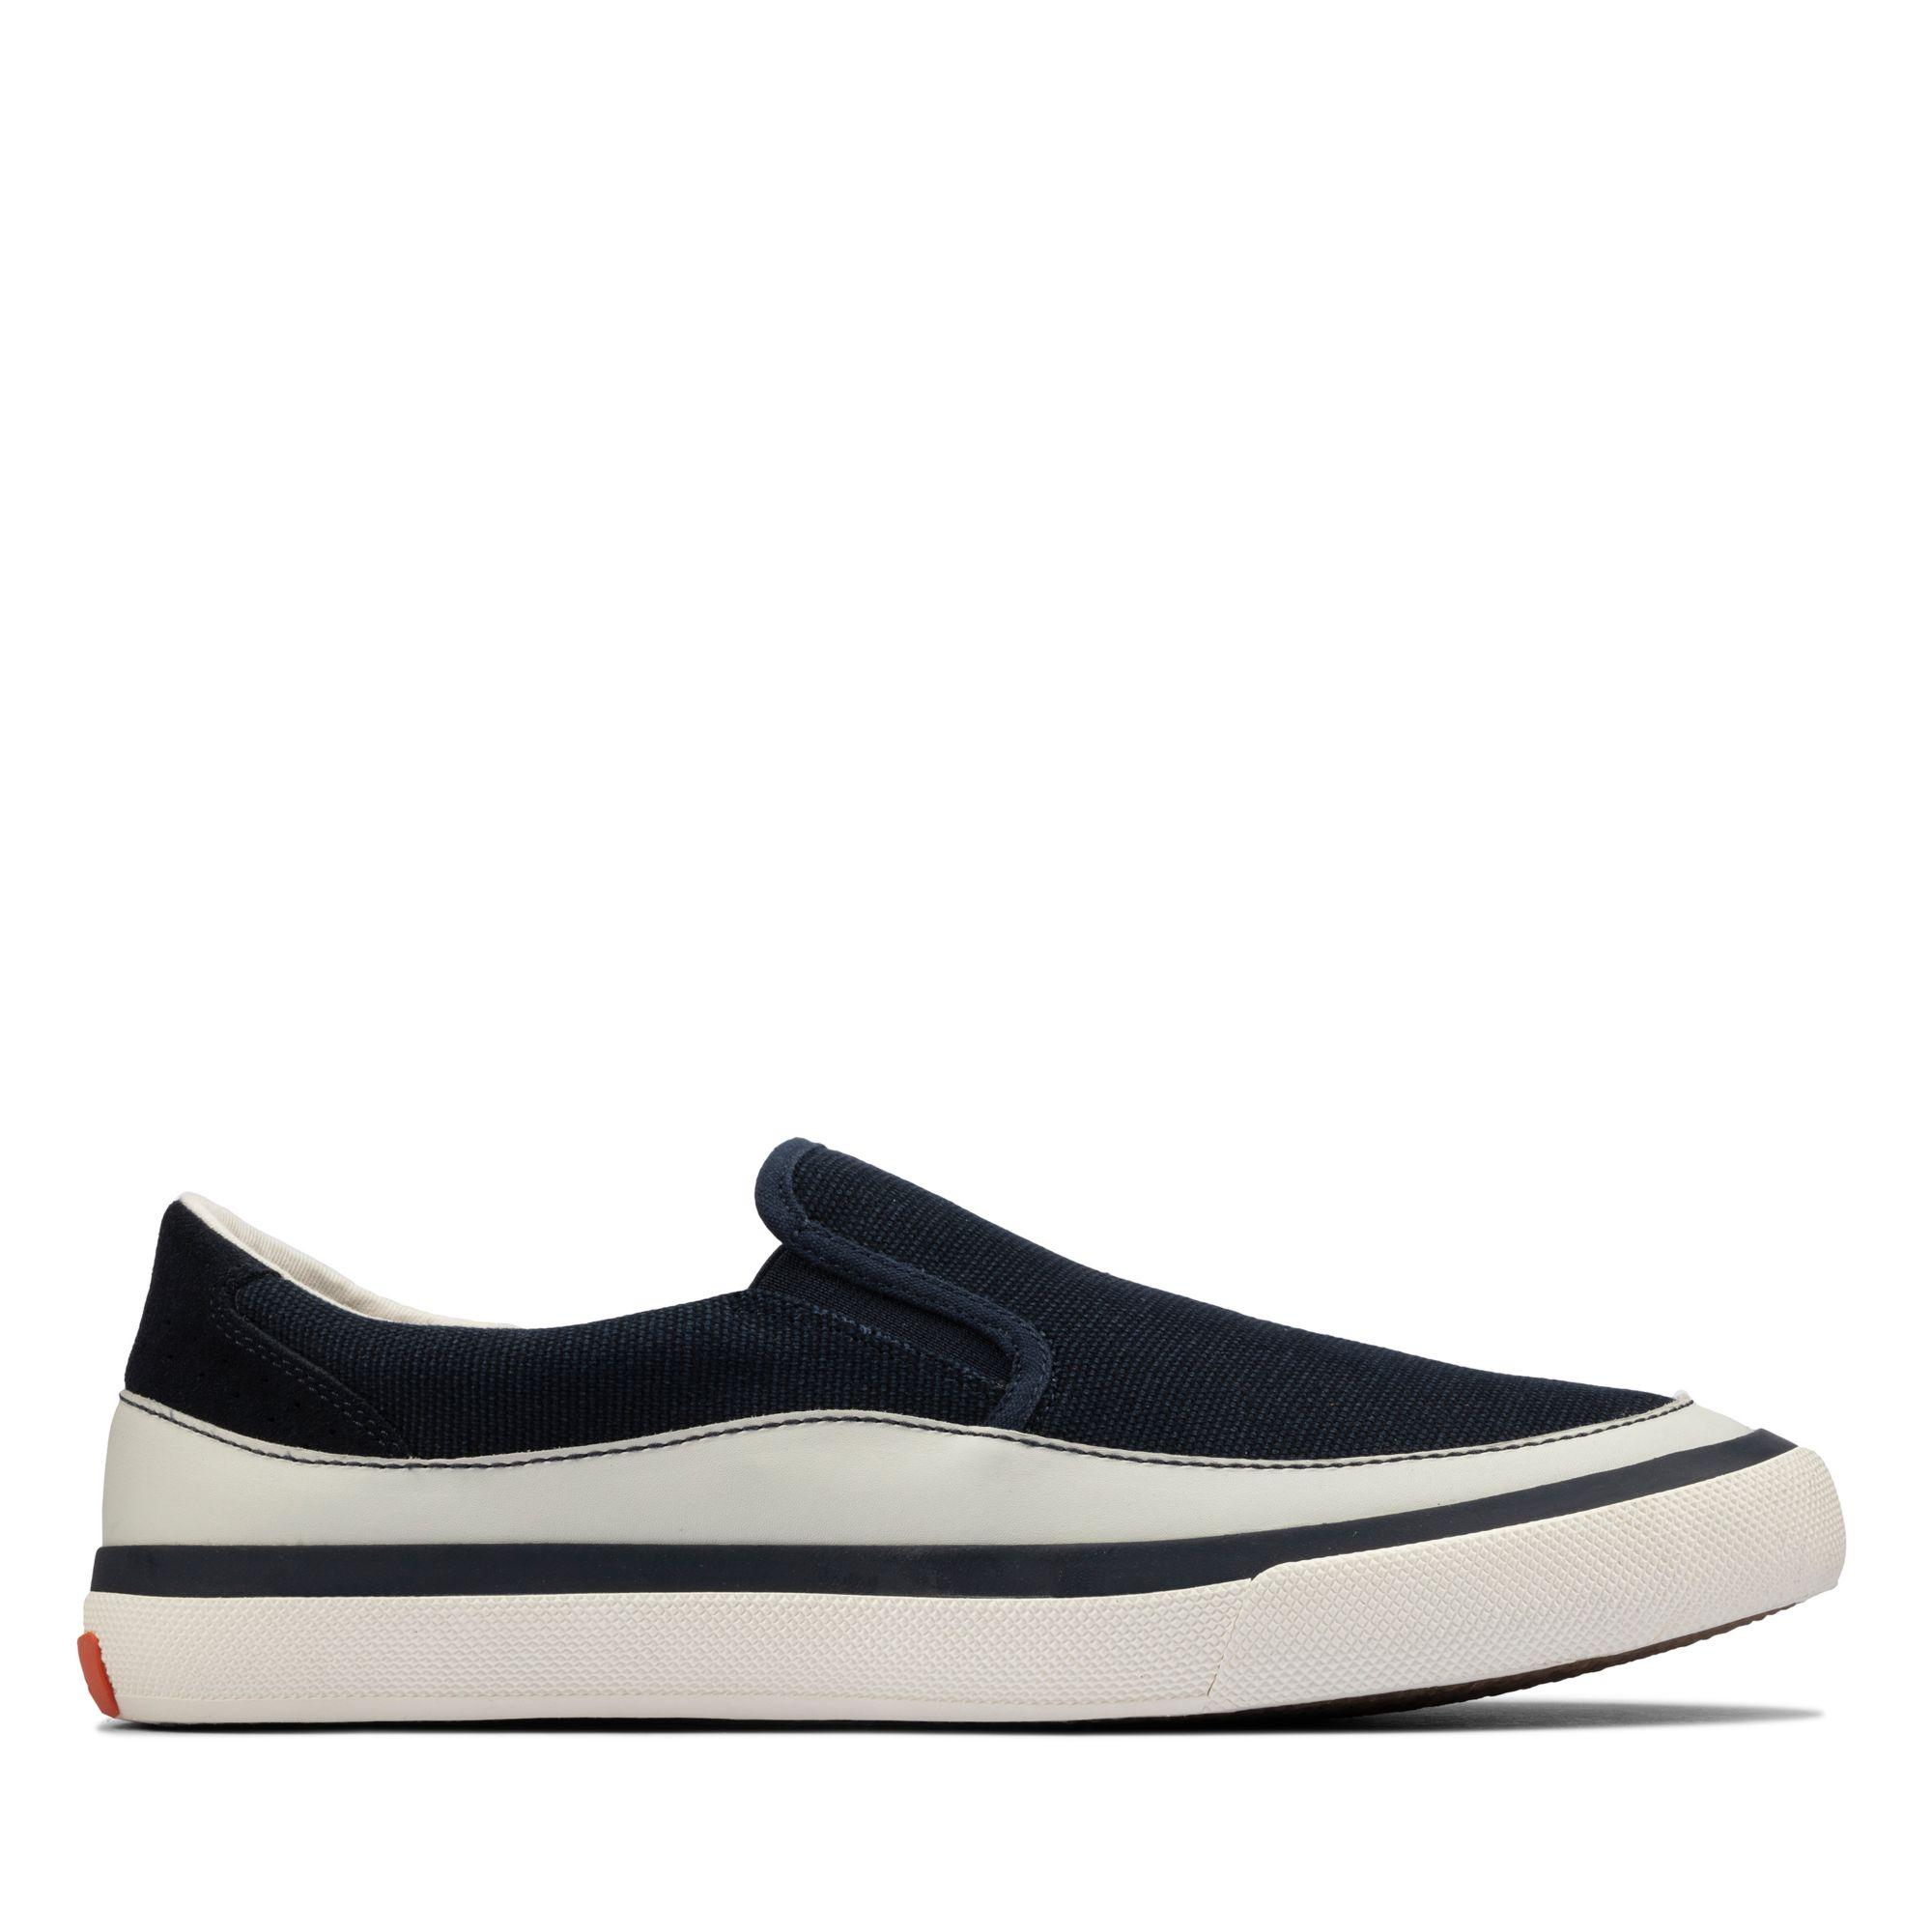 Clarks Aceley Step – Textile